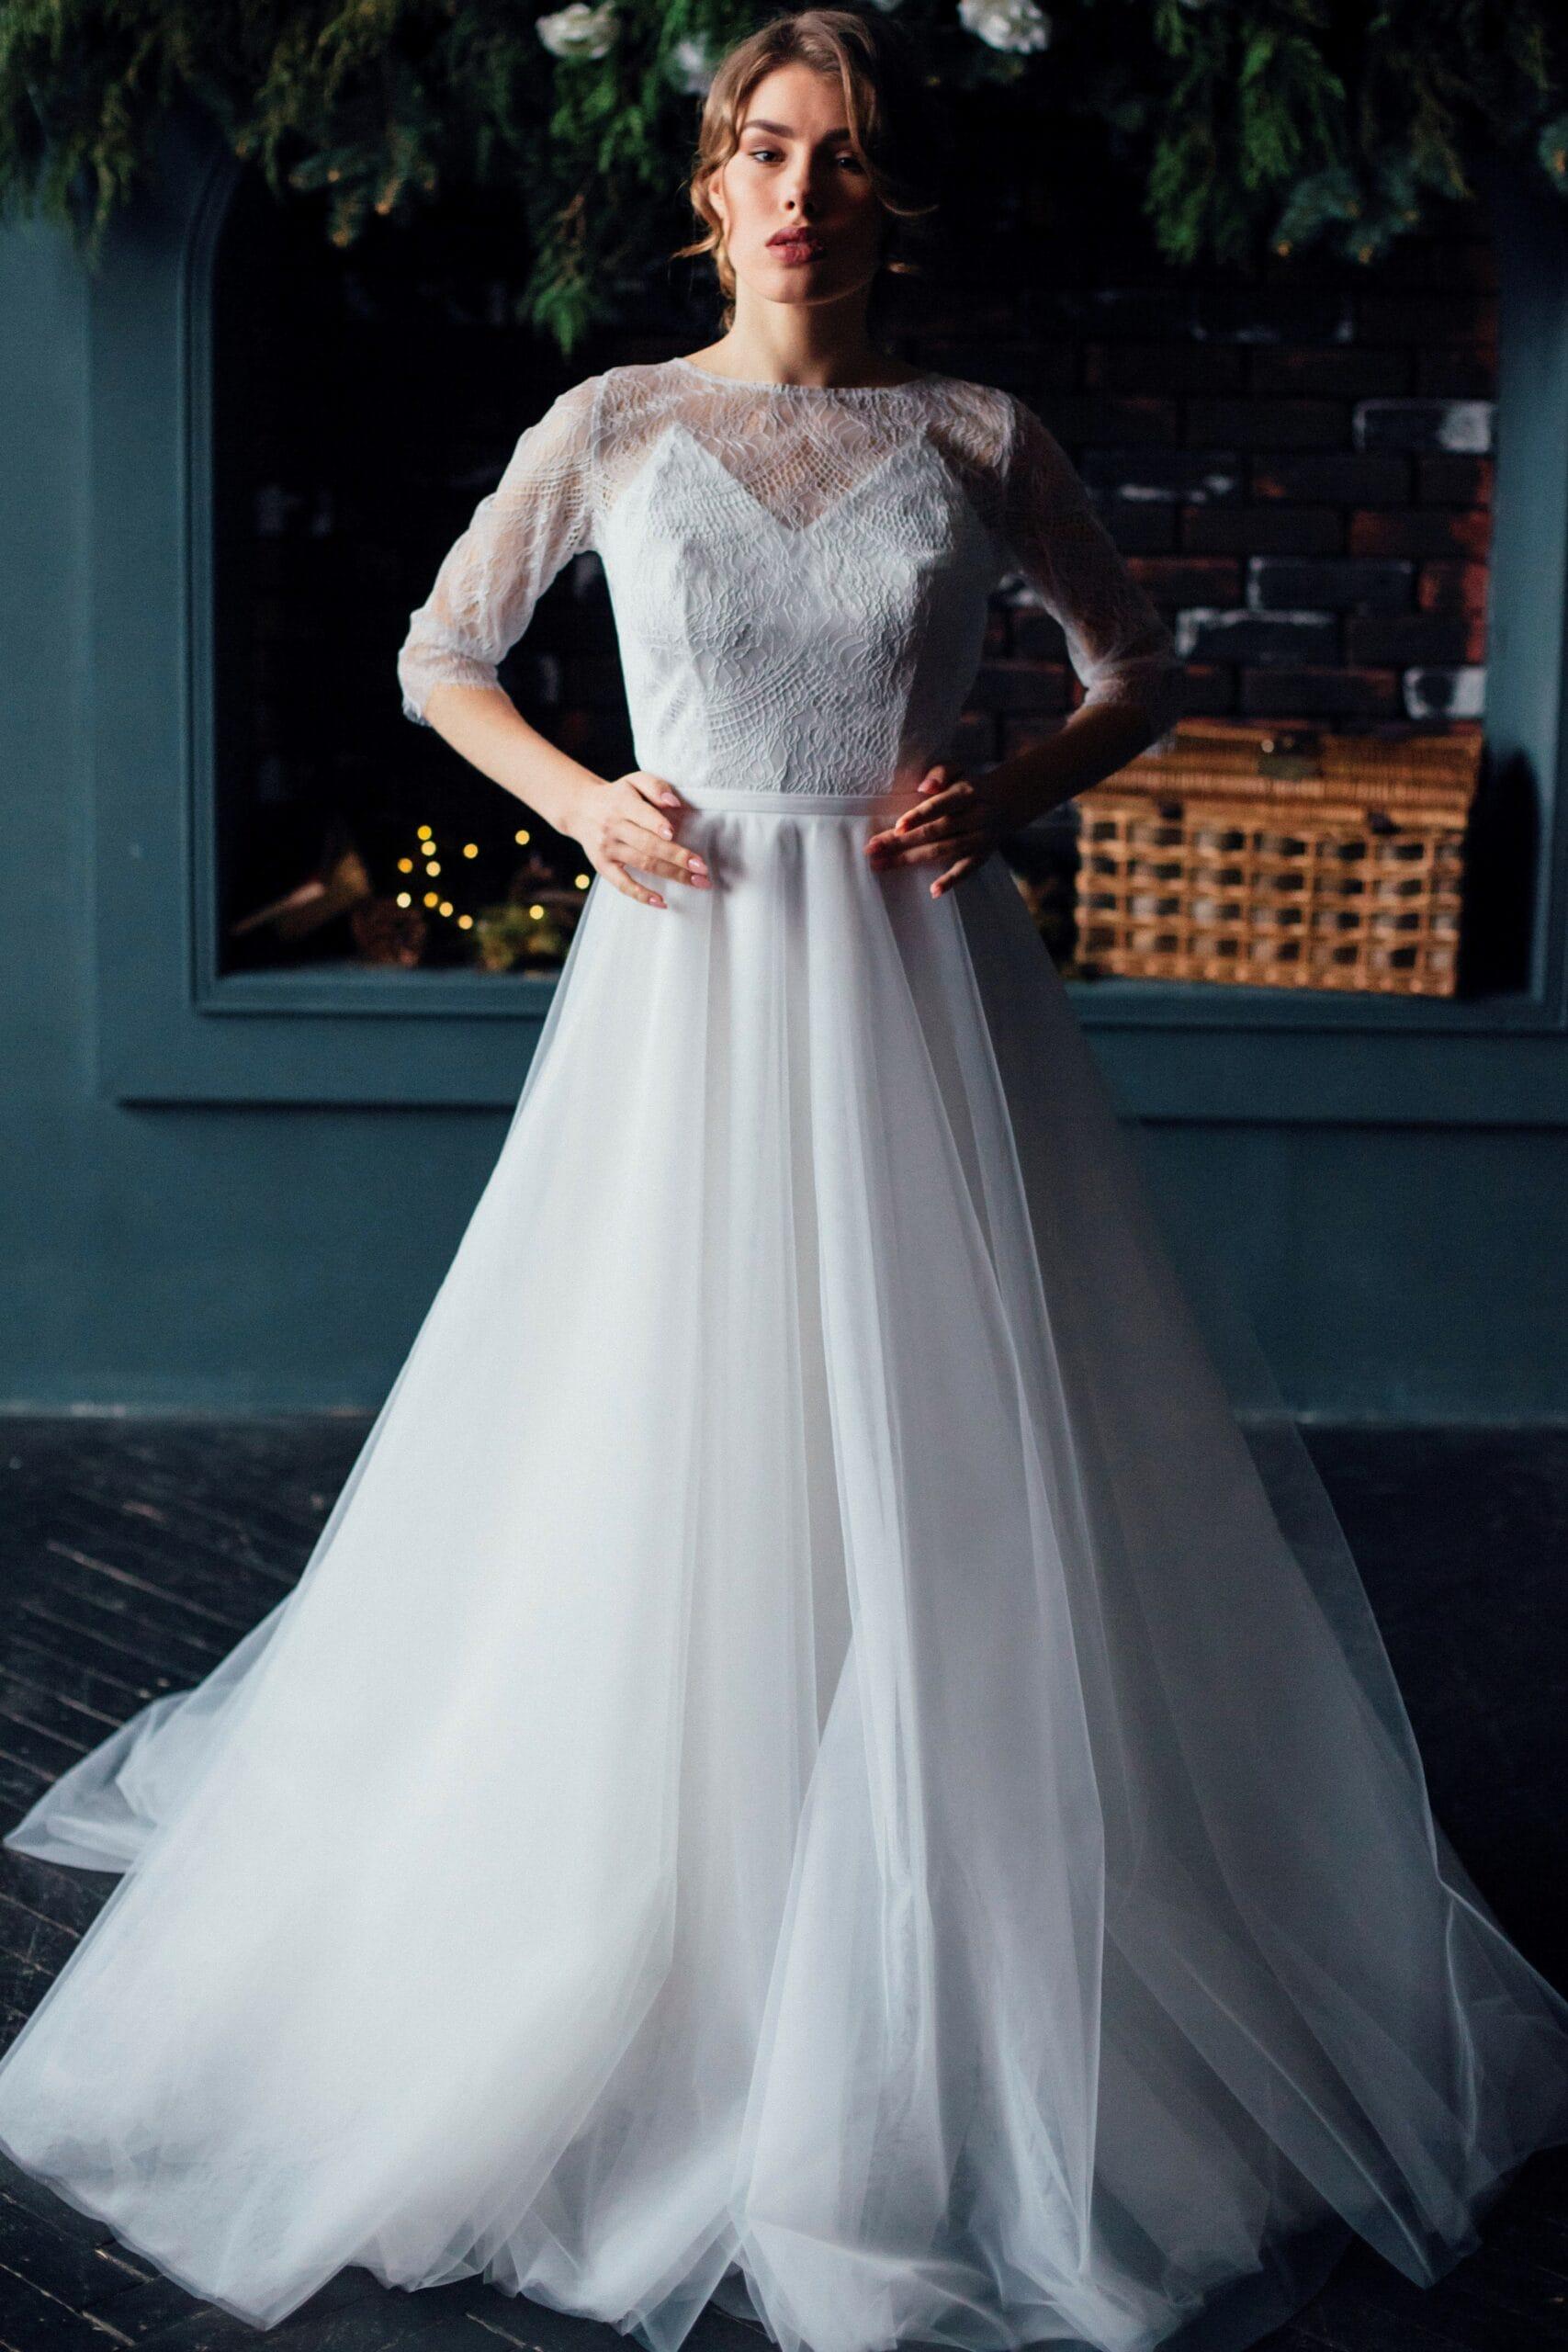 Свадебное платье DANIELLE, коллекция THE ABSOLUTE LOVE, бренд RARE BRIDAL, фото 2